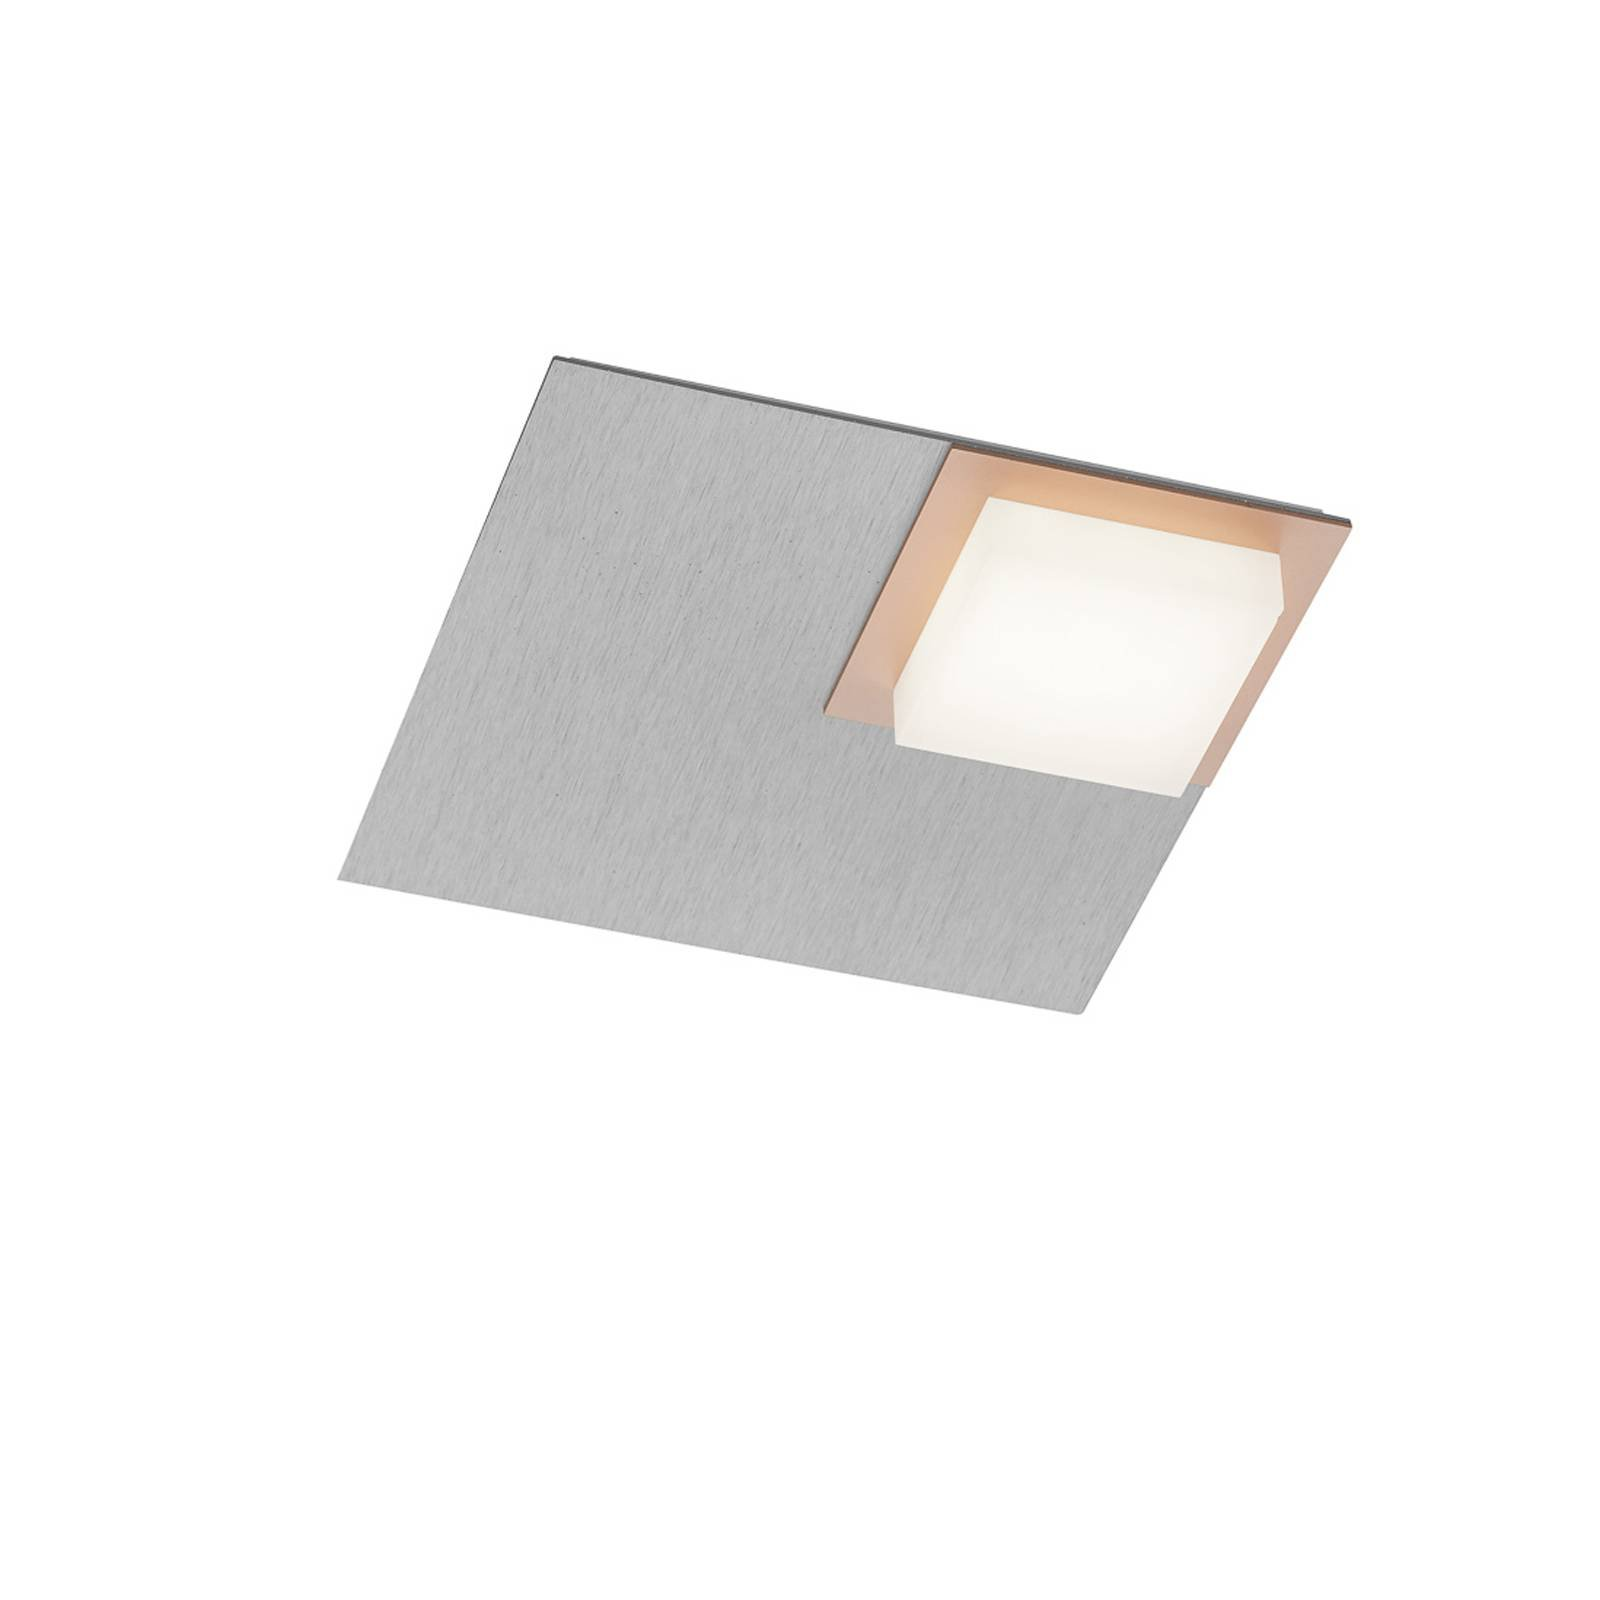 BANKAMP Quadro LED-taklampe 8 W sølv